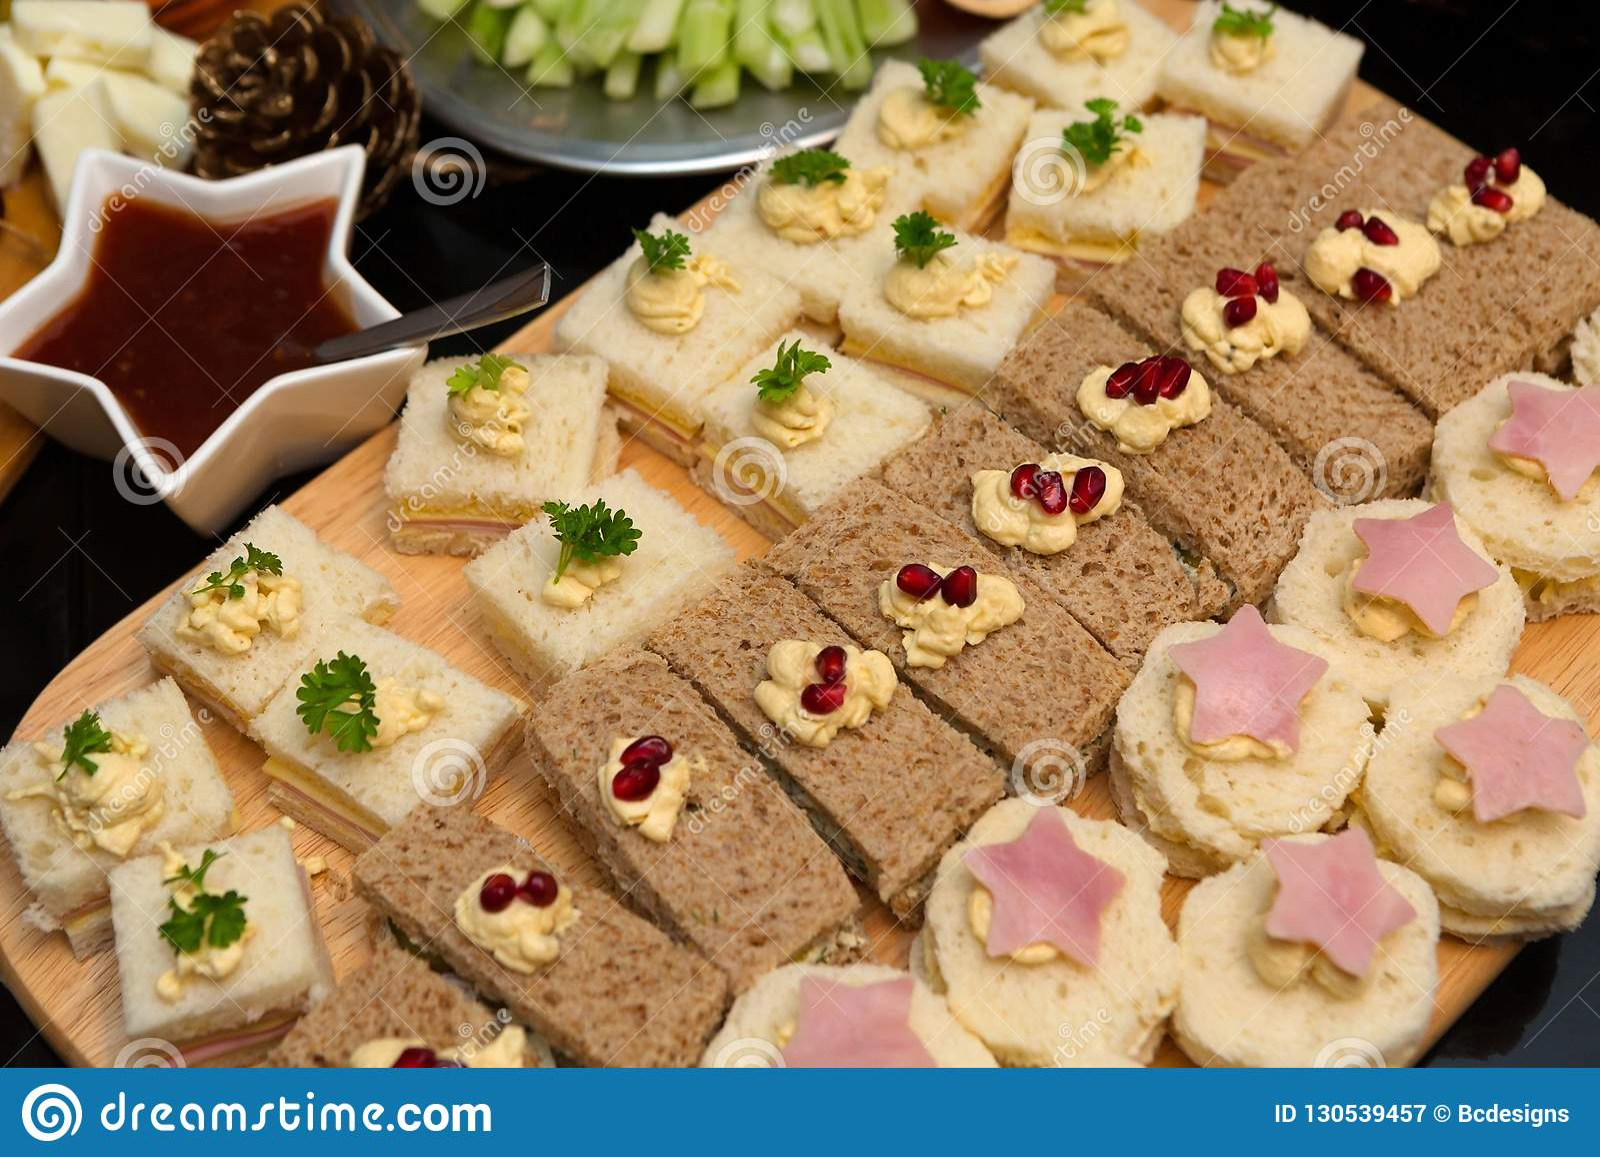 Tasty Afternoon Tea Sandwich Platter Stock Image Image Of